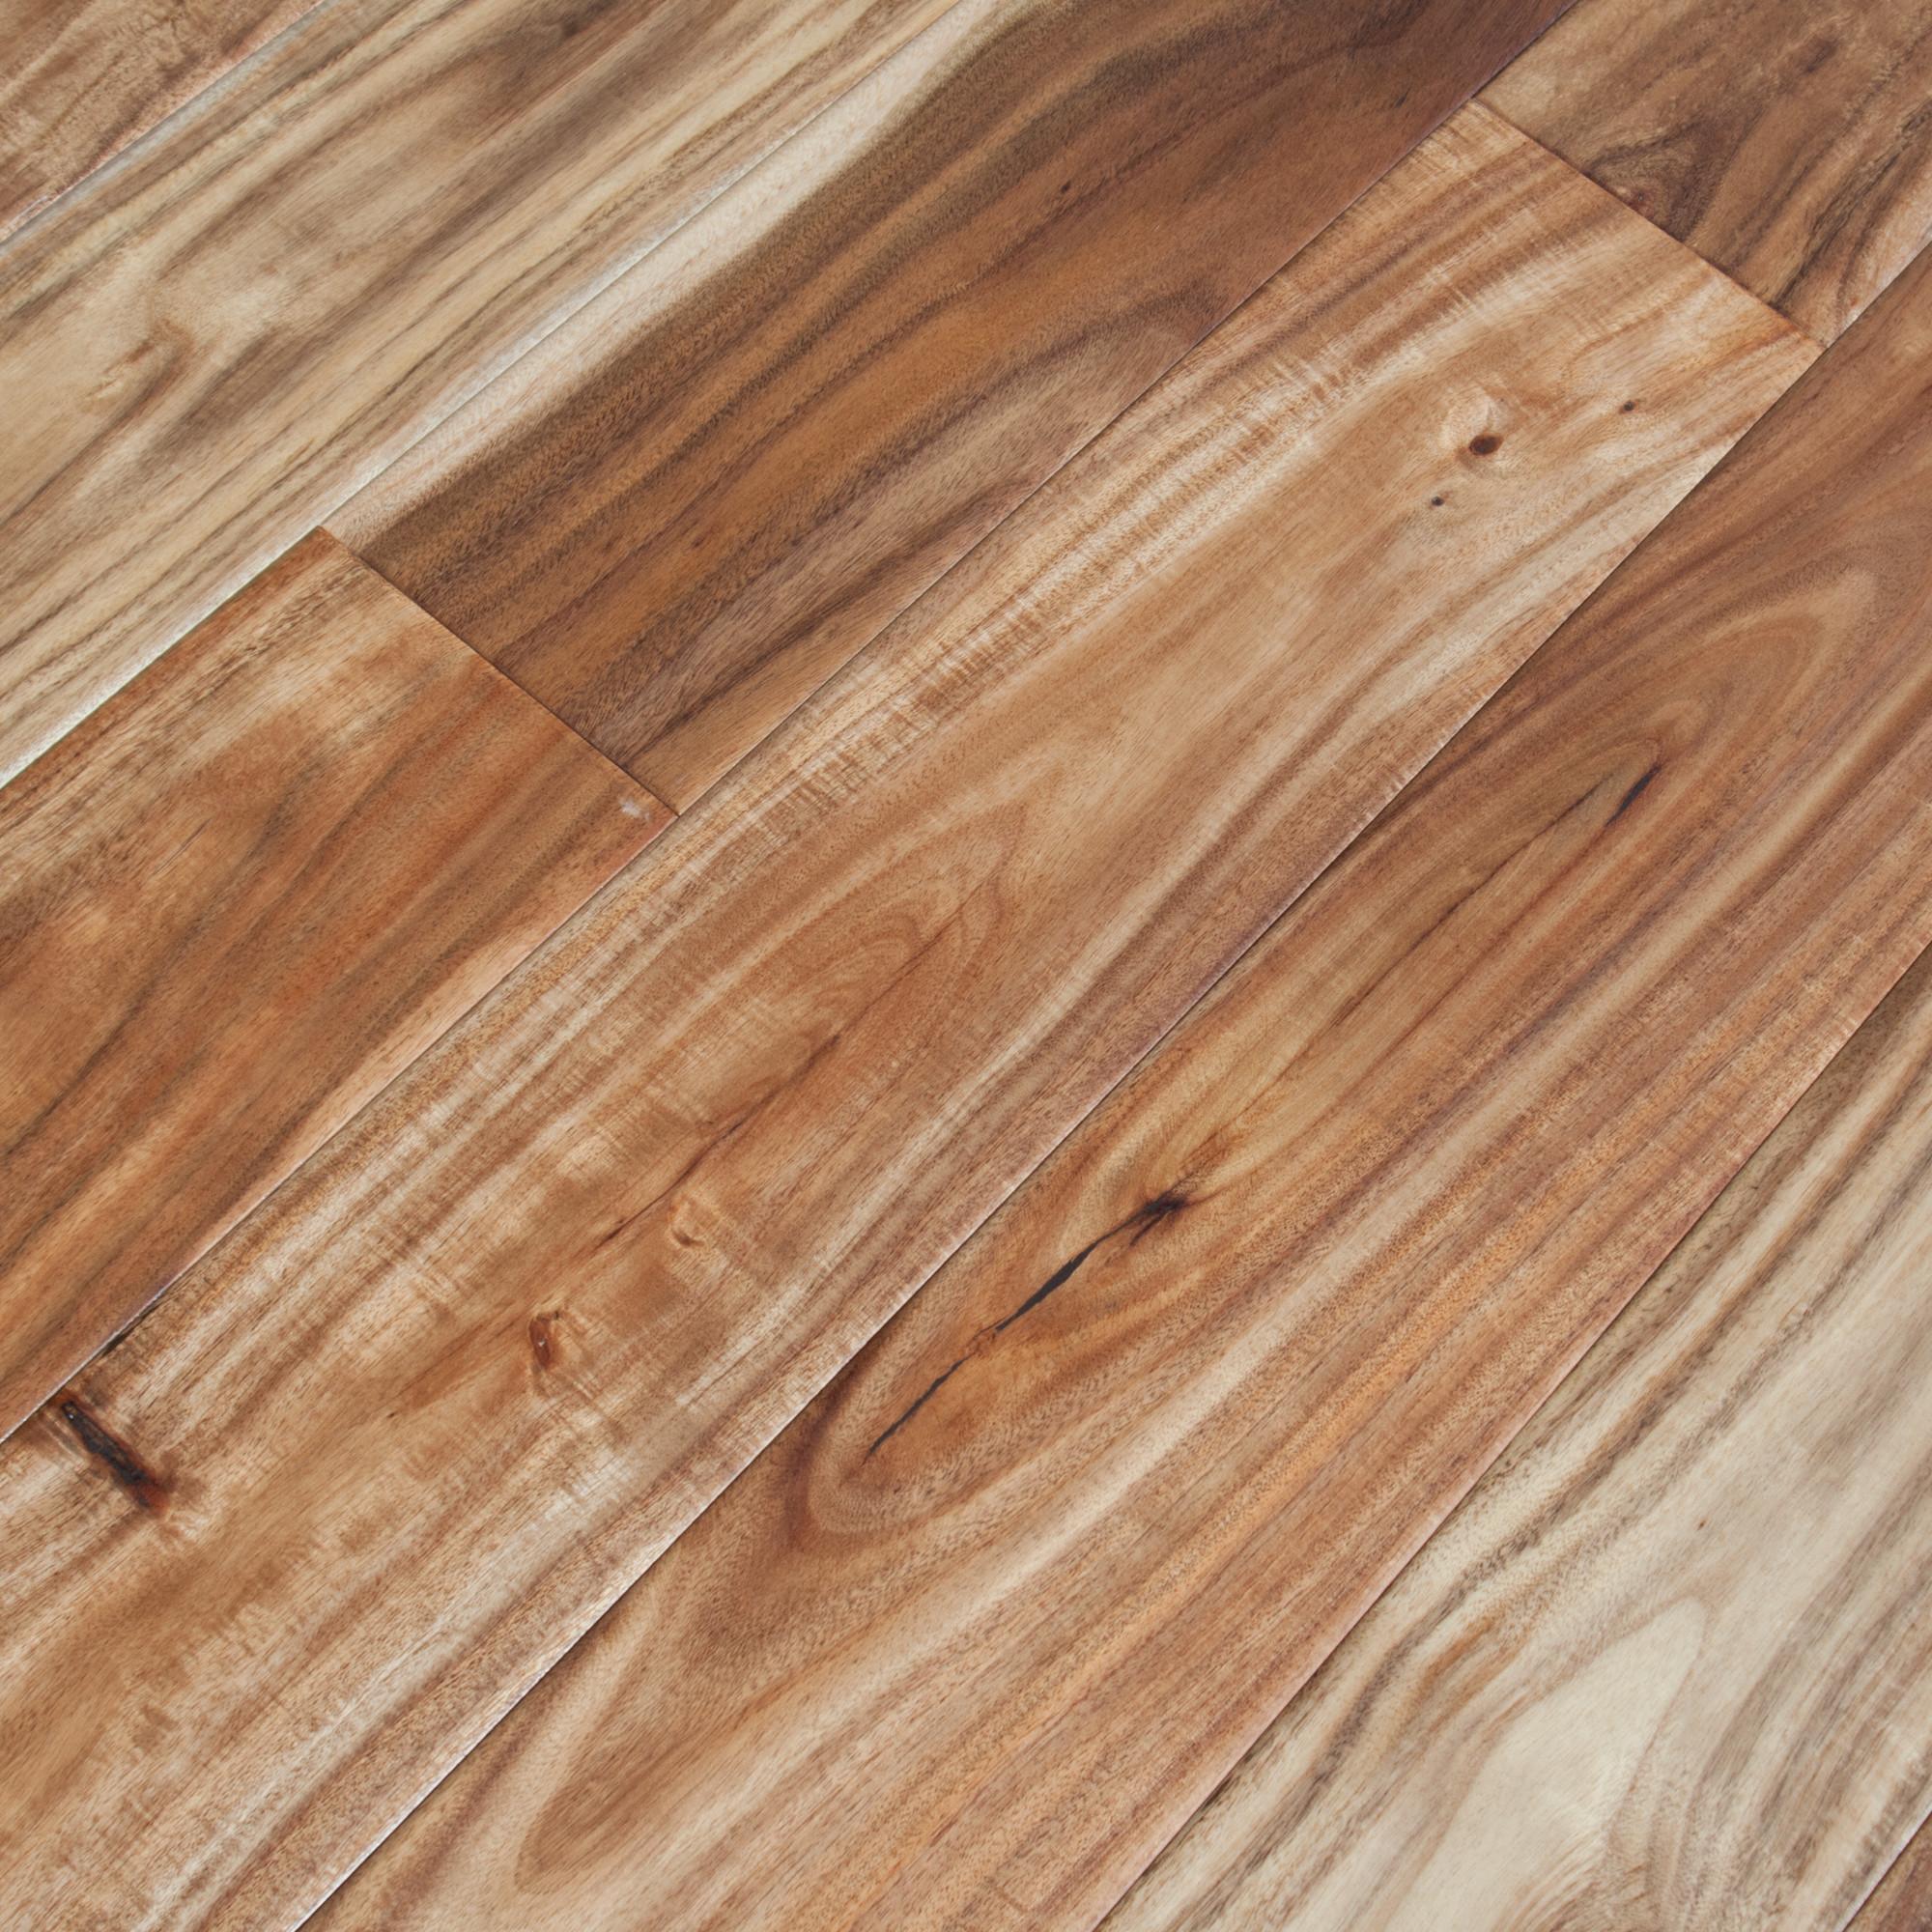 3 4 engineered hardwood flooring of 9 mile creek acacia hand scraped acacia confusa wood floors regarding acacia handscraped natural hardwood flooring